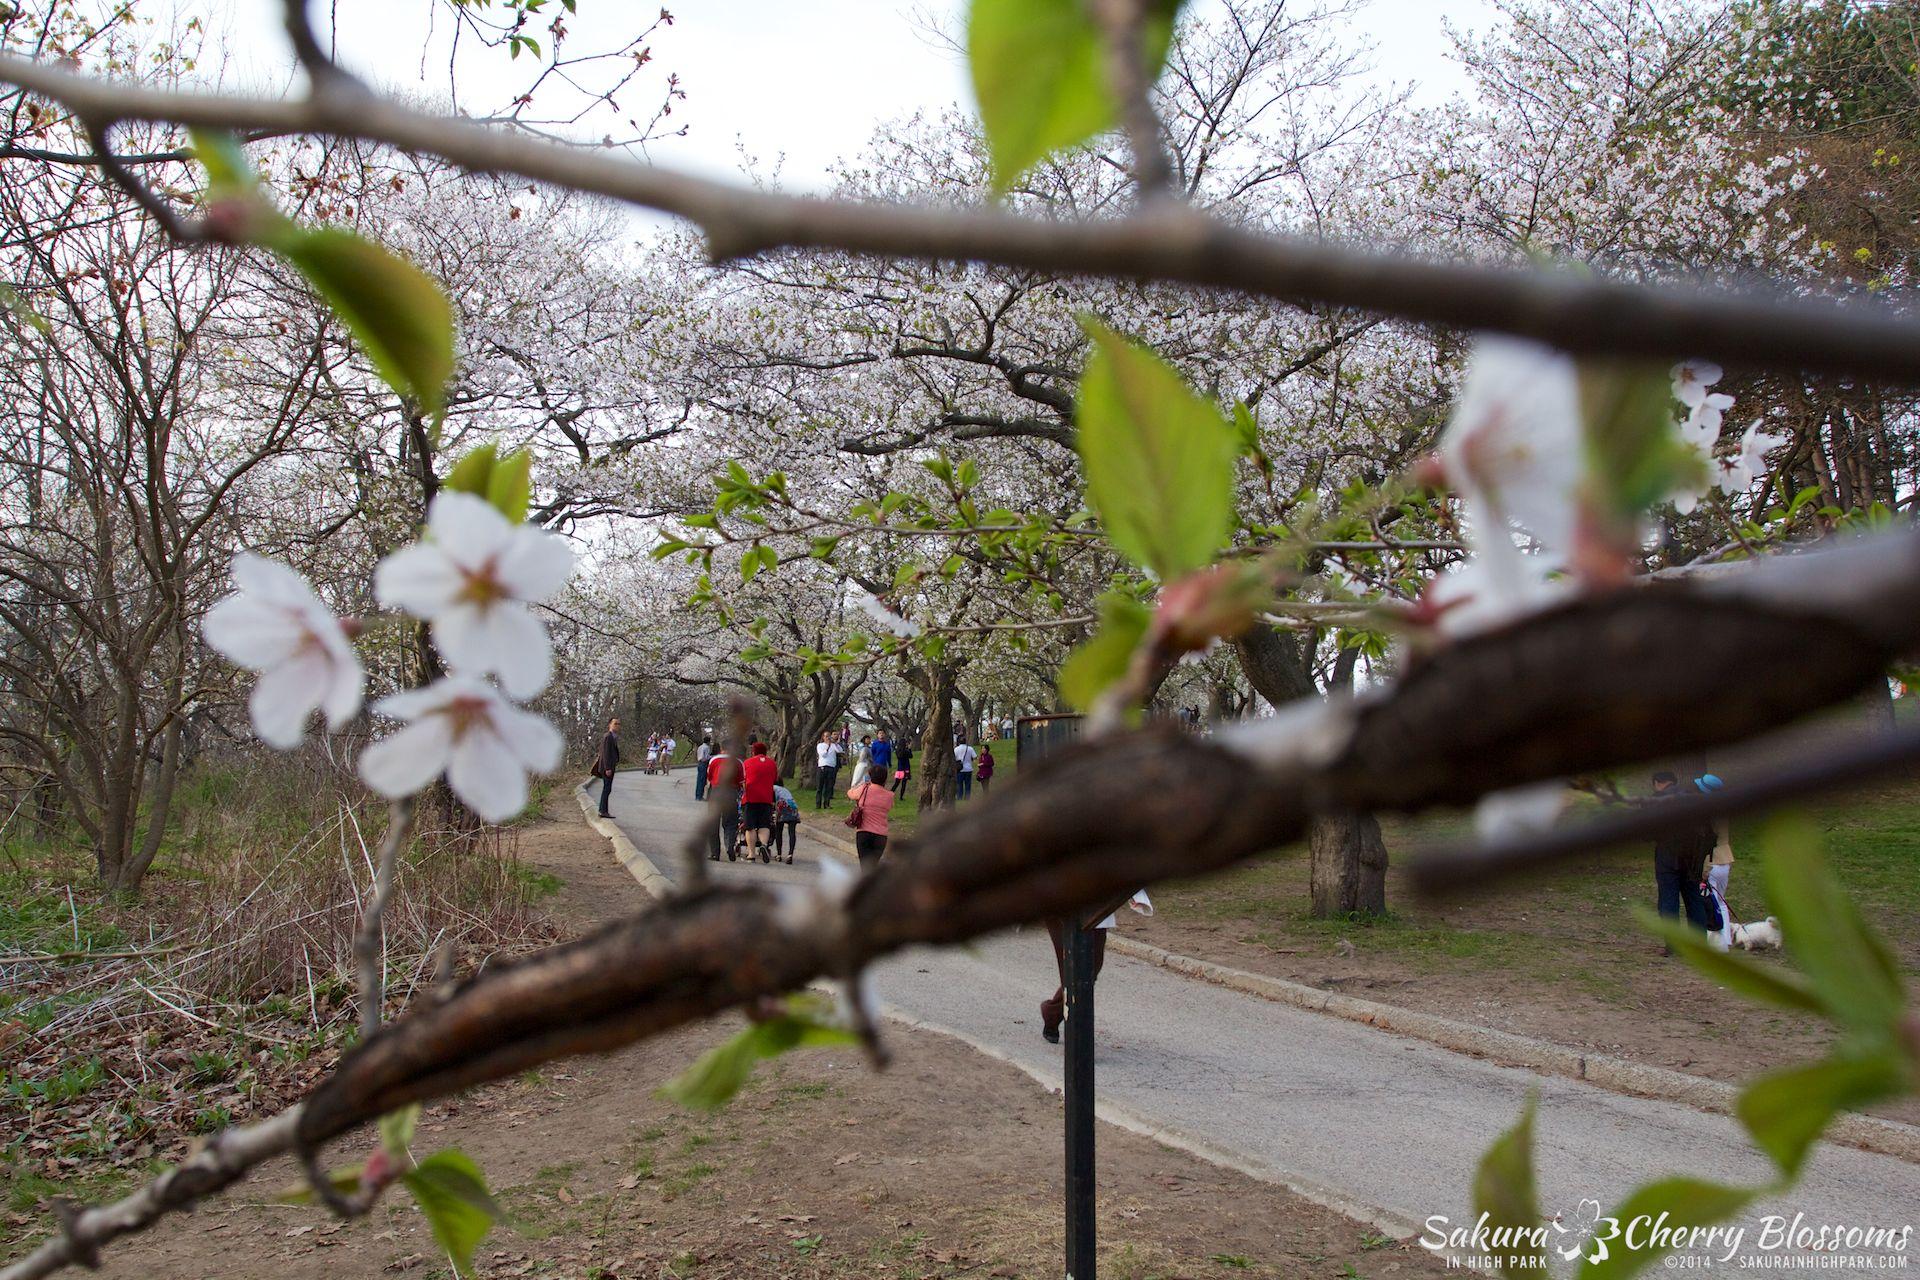 SakuraInHighPark-May1314-470.jpg